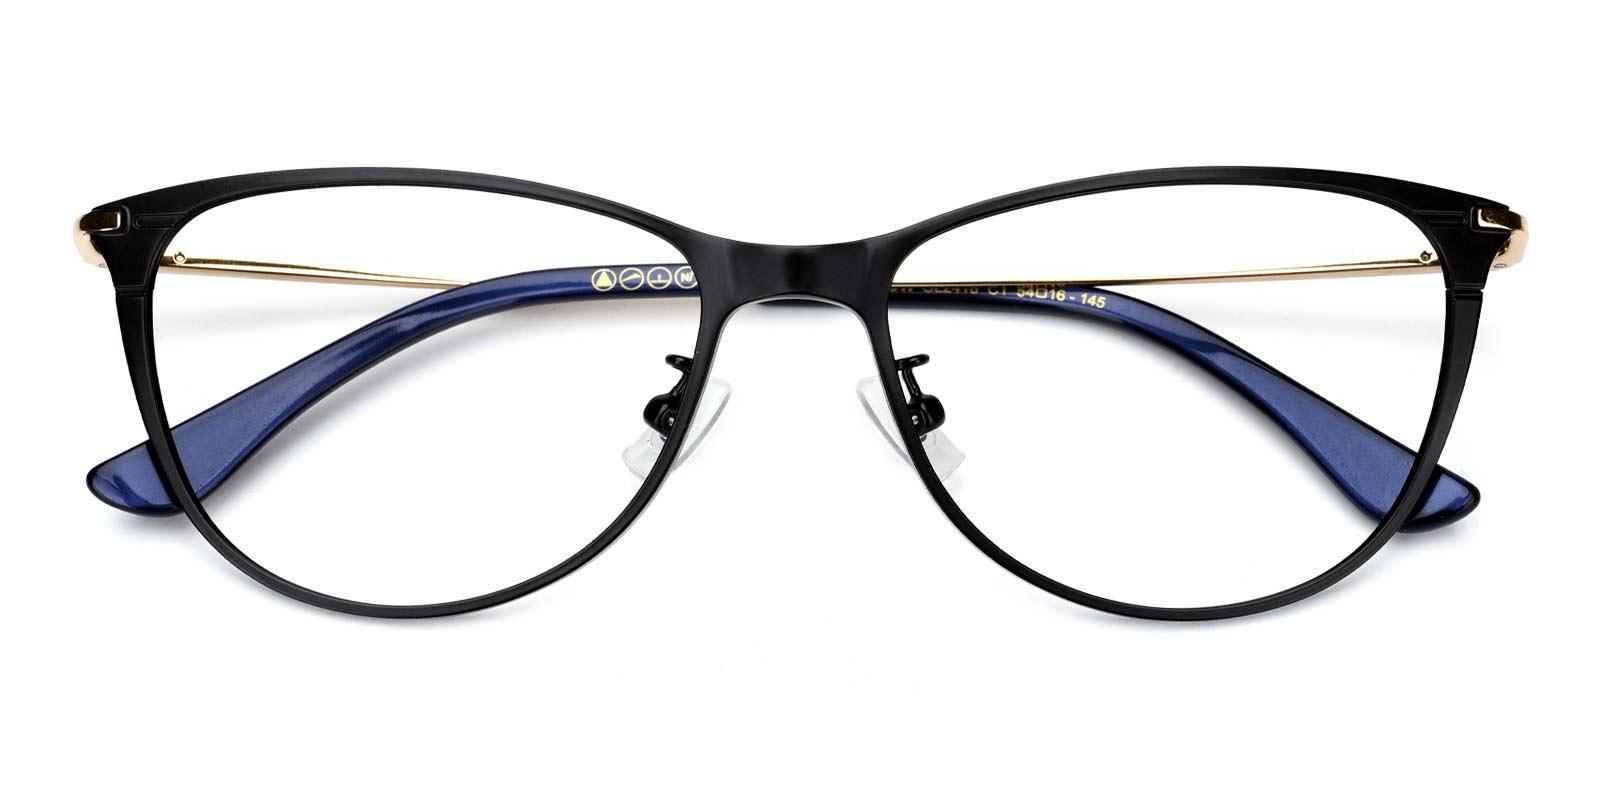 Carter-Black-Cat-Titanium-Eyeglasses-detail